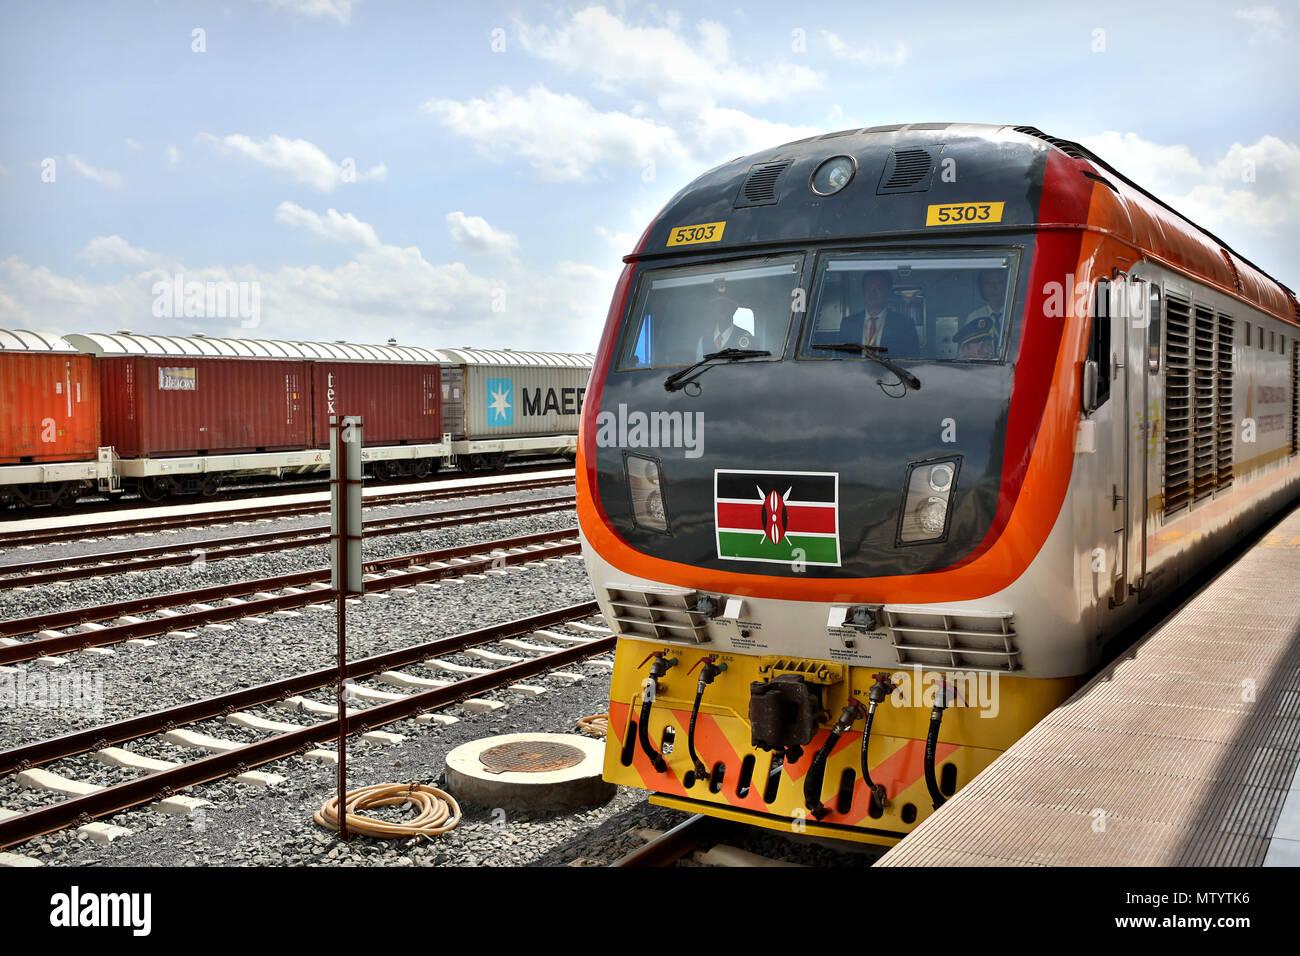 Nairobi, Kenya  31st May, 2018  A train leaves the Nairobi